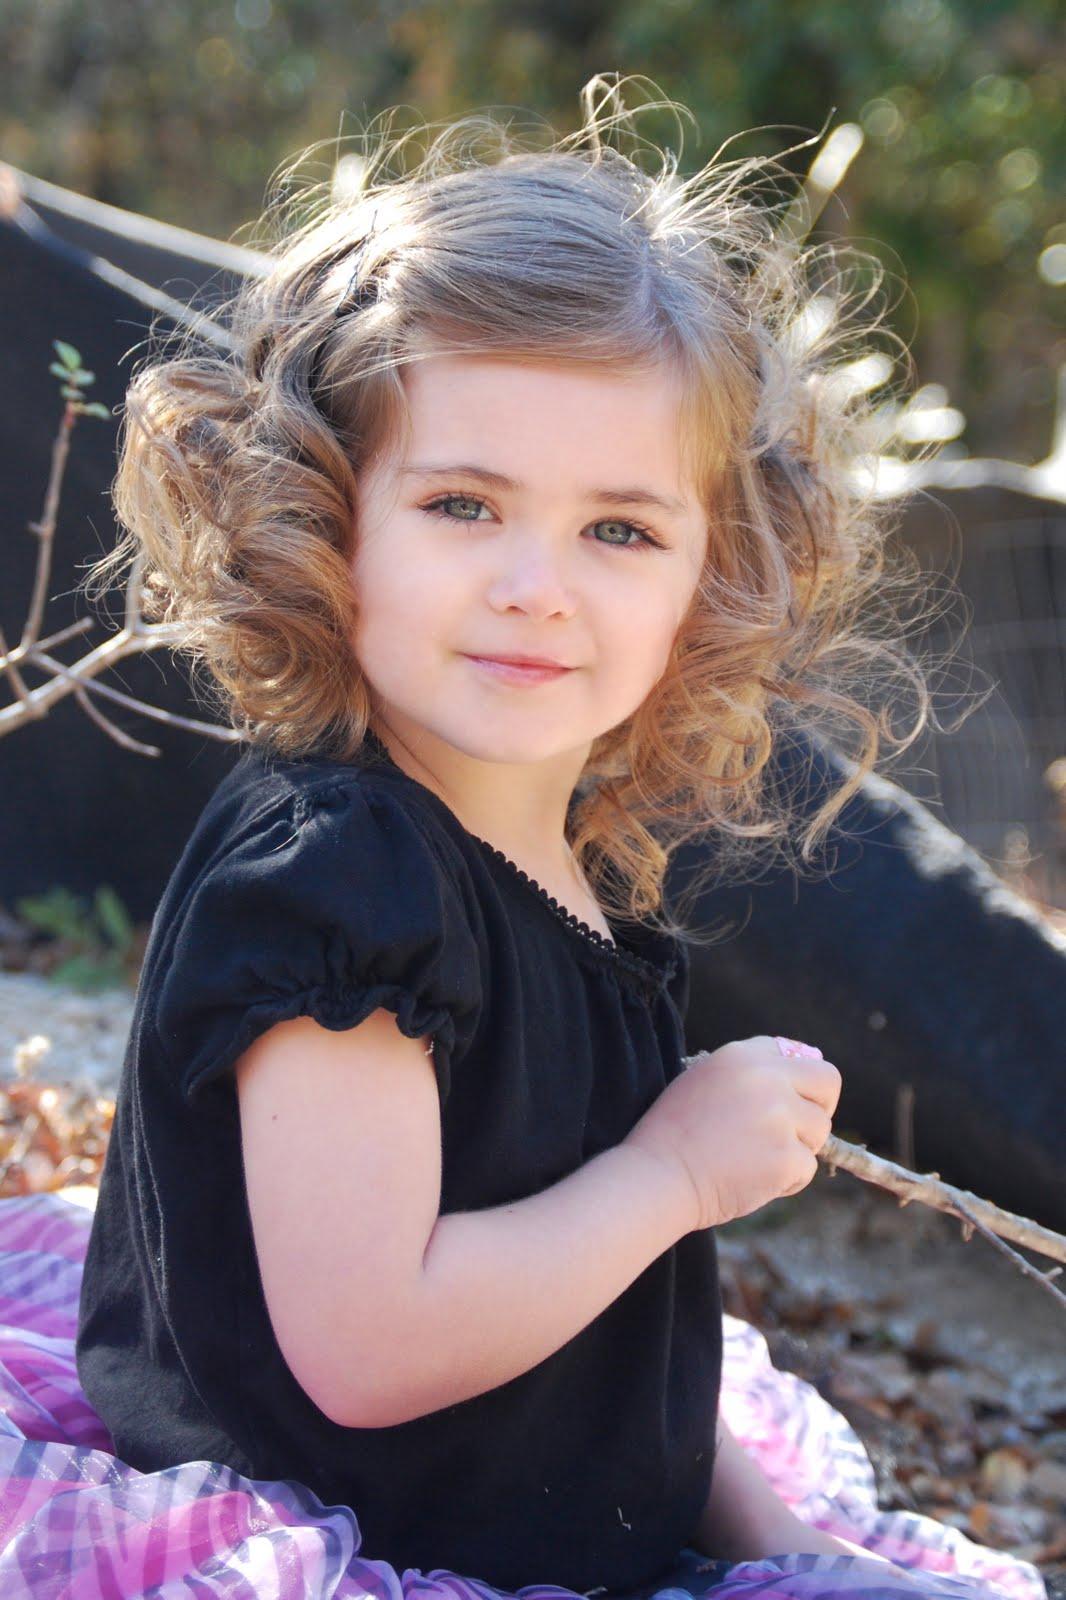 Babies Wallpapers Cute Baby Pictures صور اطفال بنات صغيرة مواليد في خلفيات بنات بجودة Hd سوبر